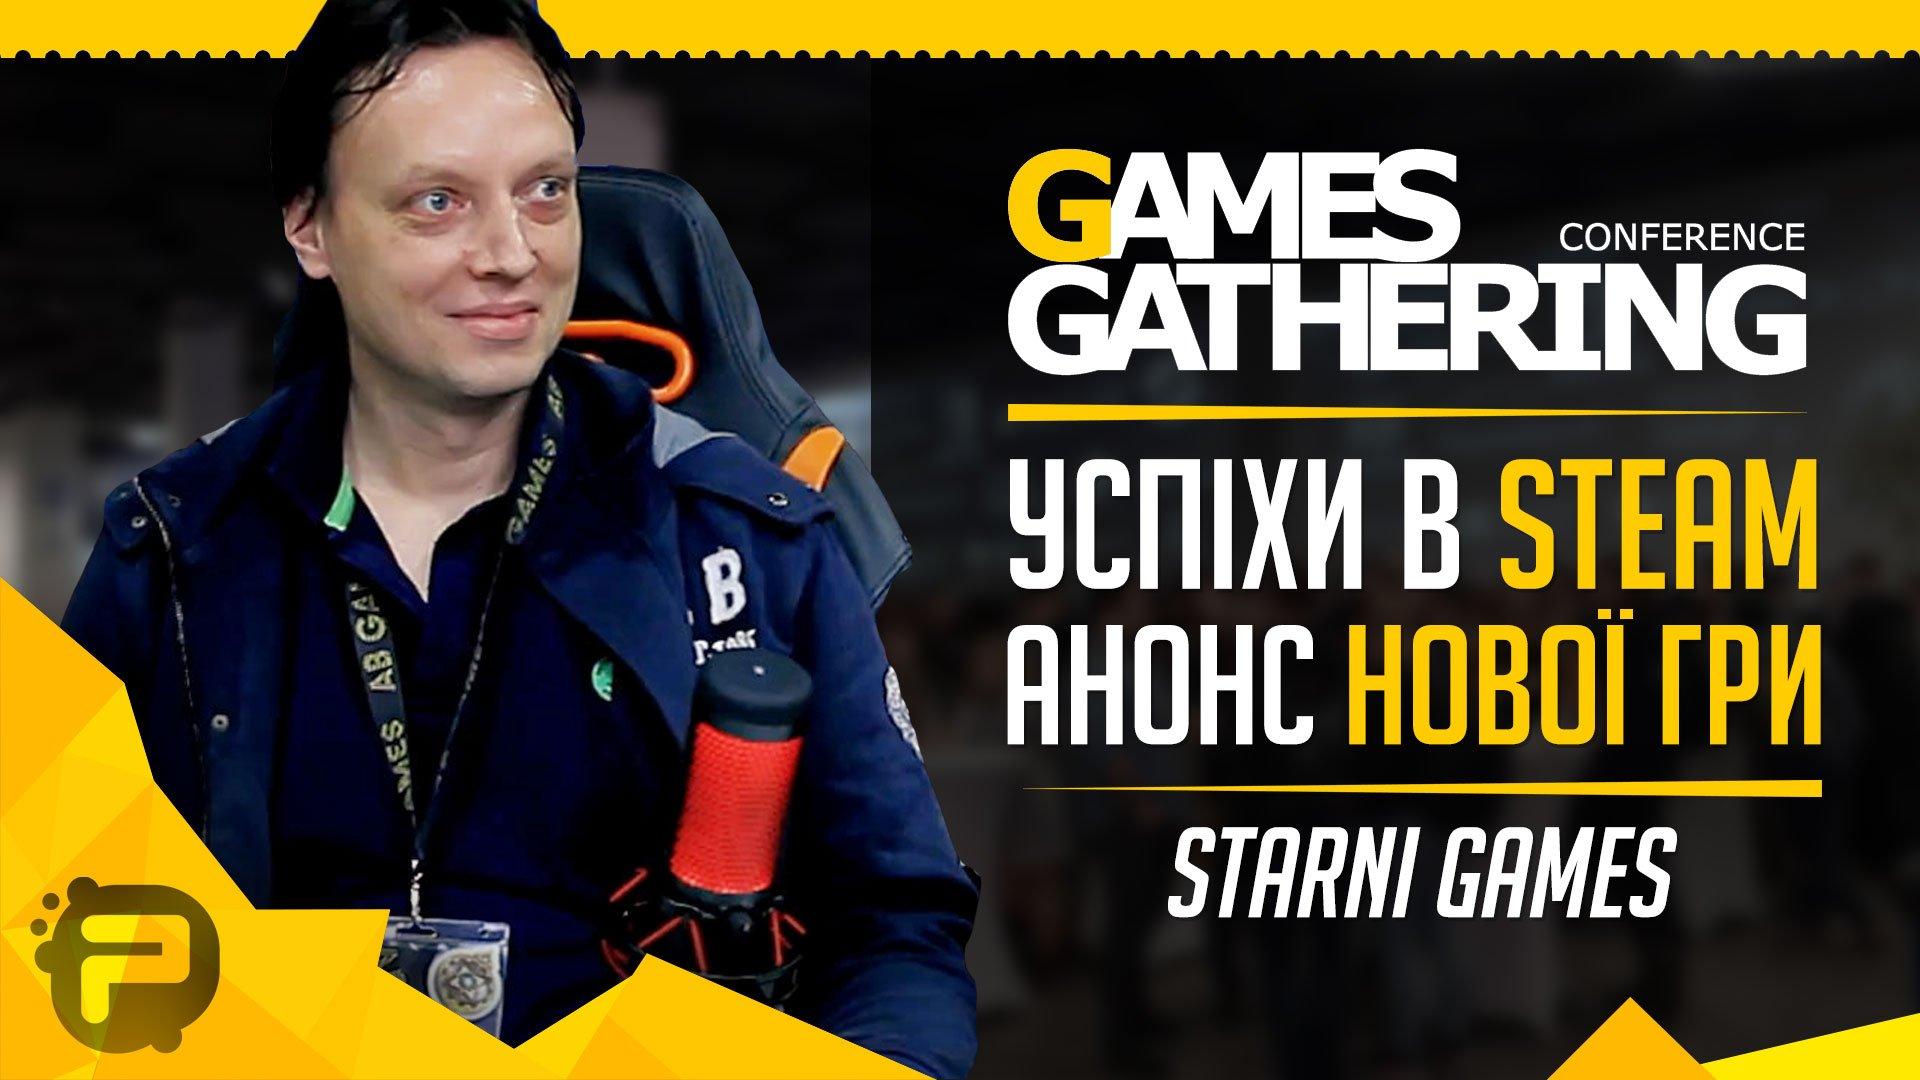 Starni Games